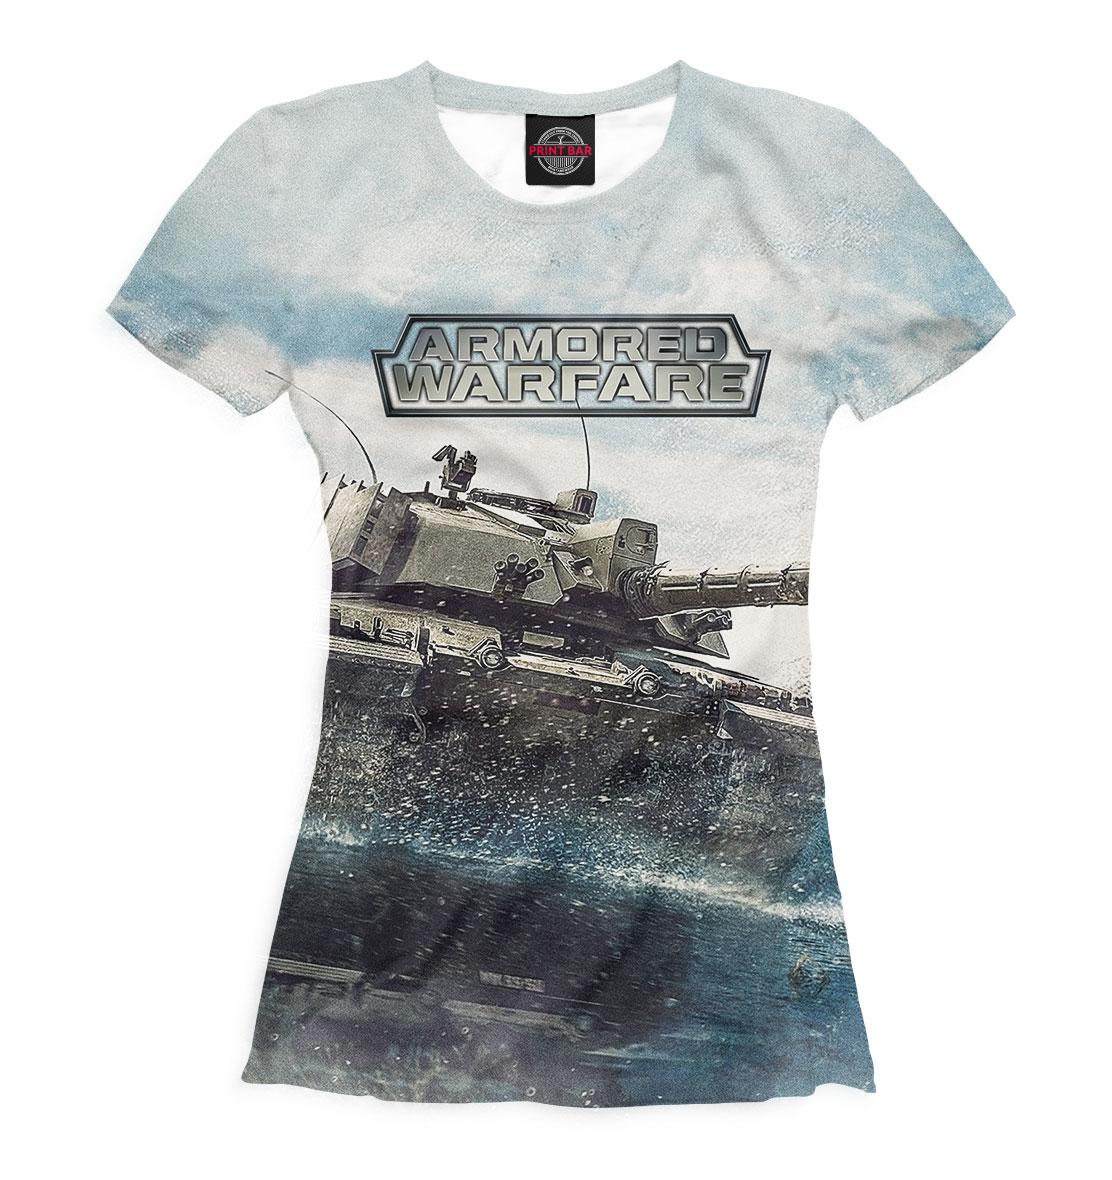 Купить Armored Warfare, Printbar, Футболки, ARW-391067-fut-1